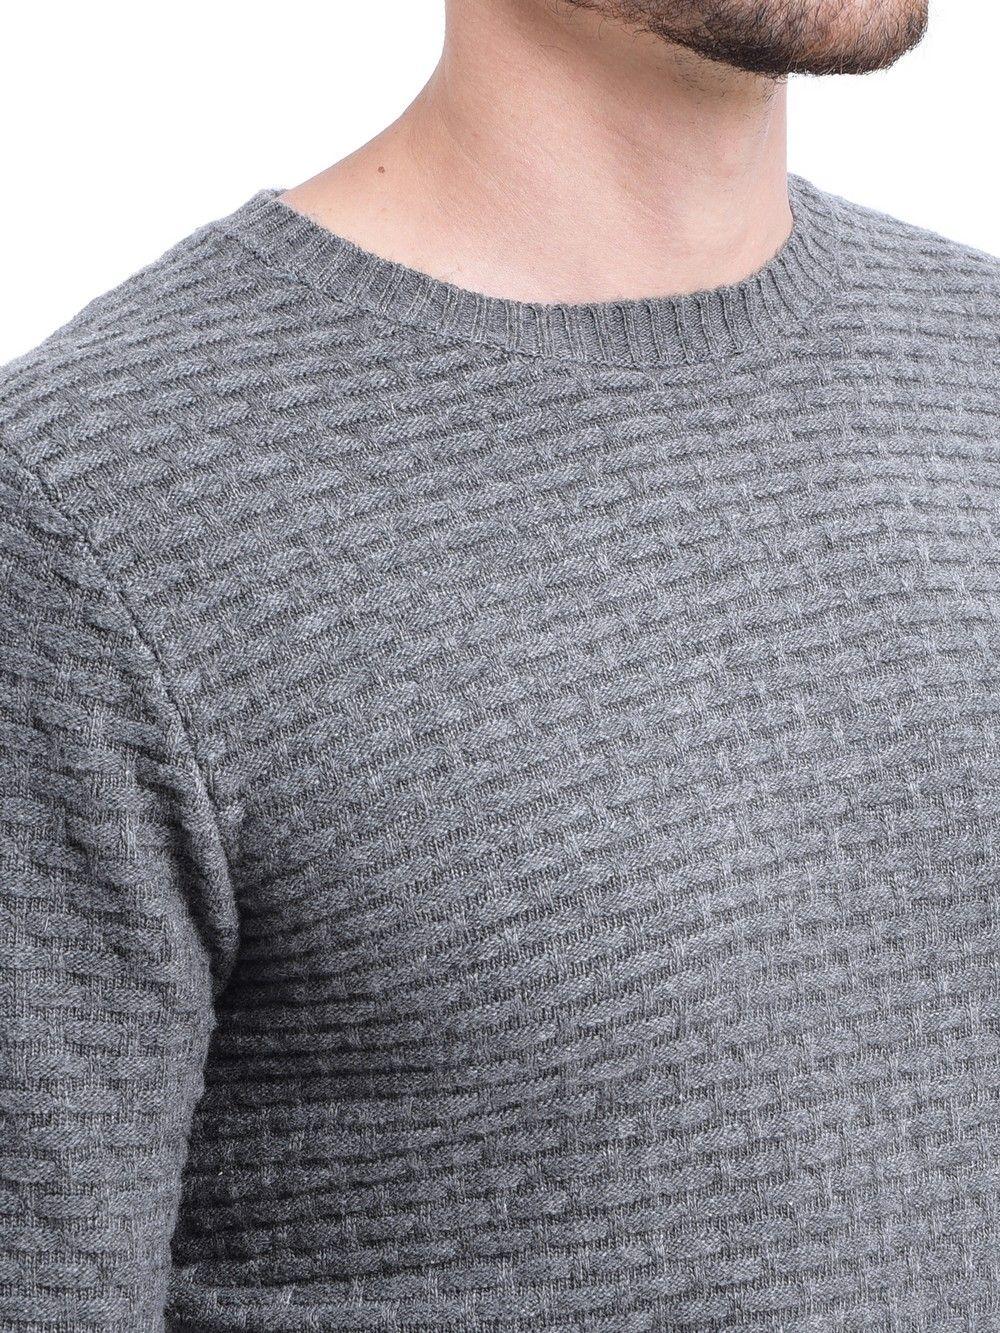 William De Faye Round Neck Jacquard Sweater in Grey